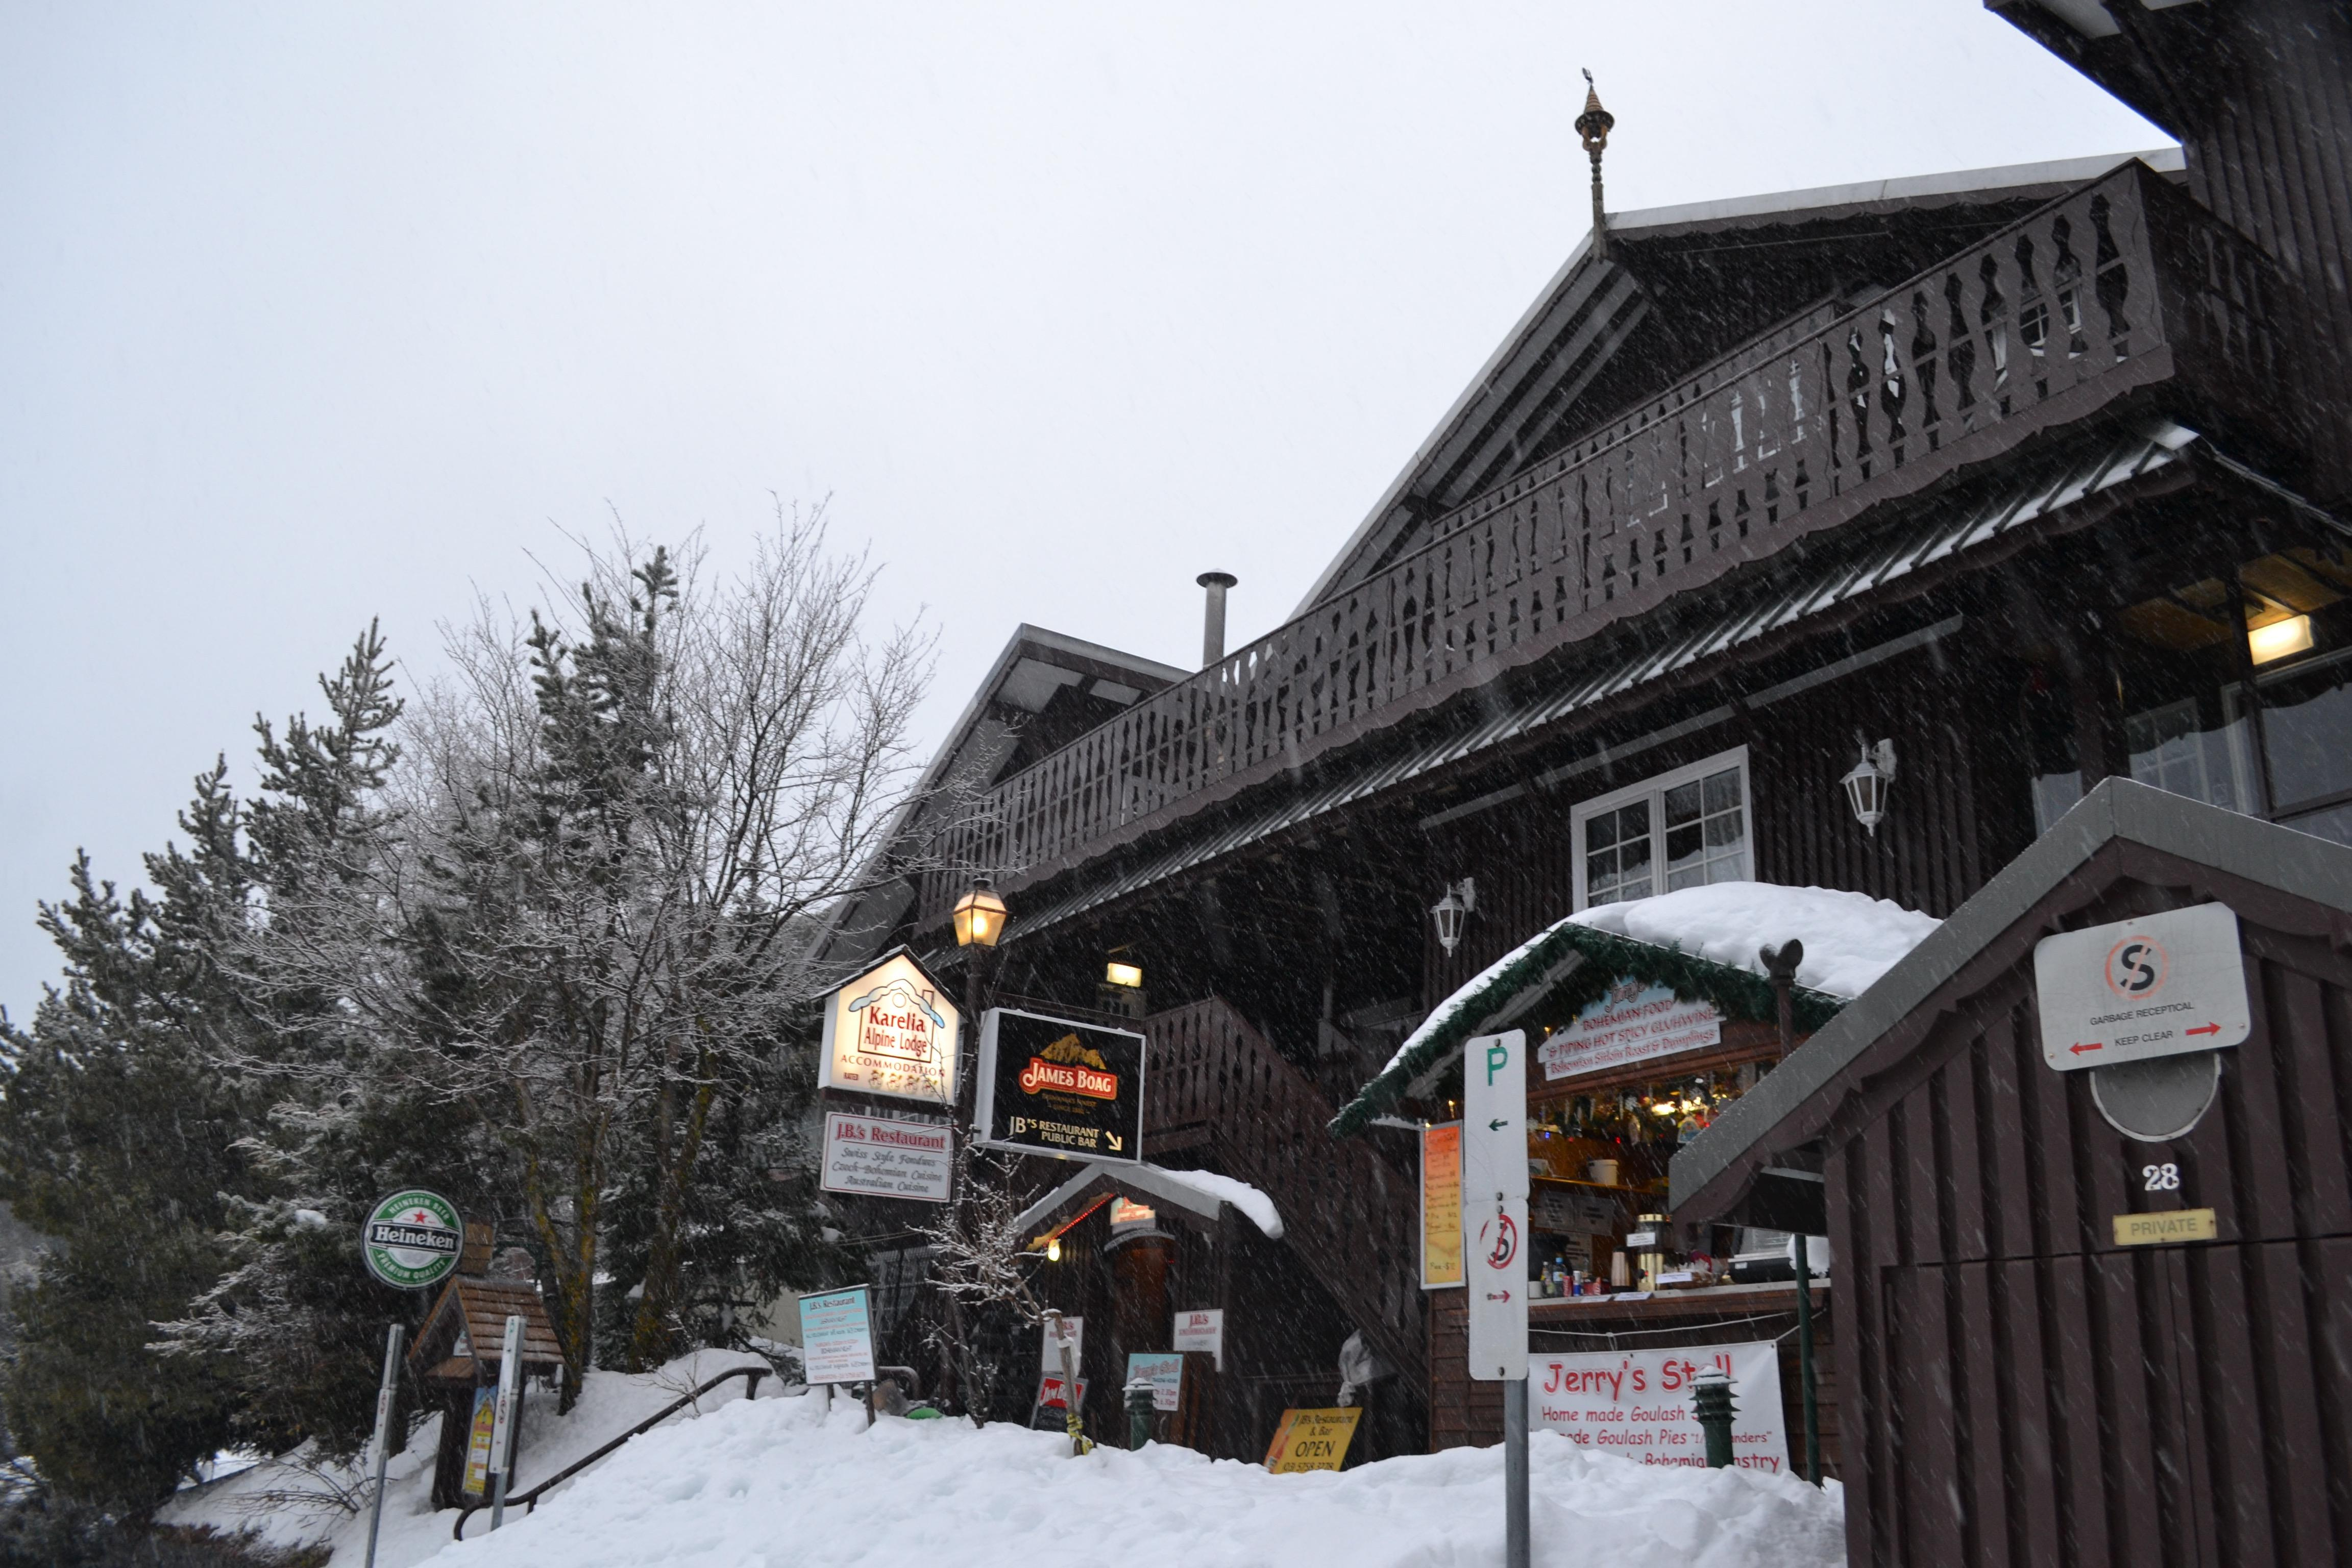 Entrance to Restaurant & Bar